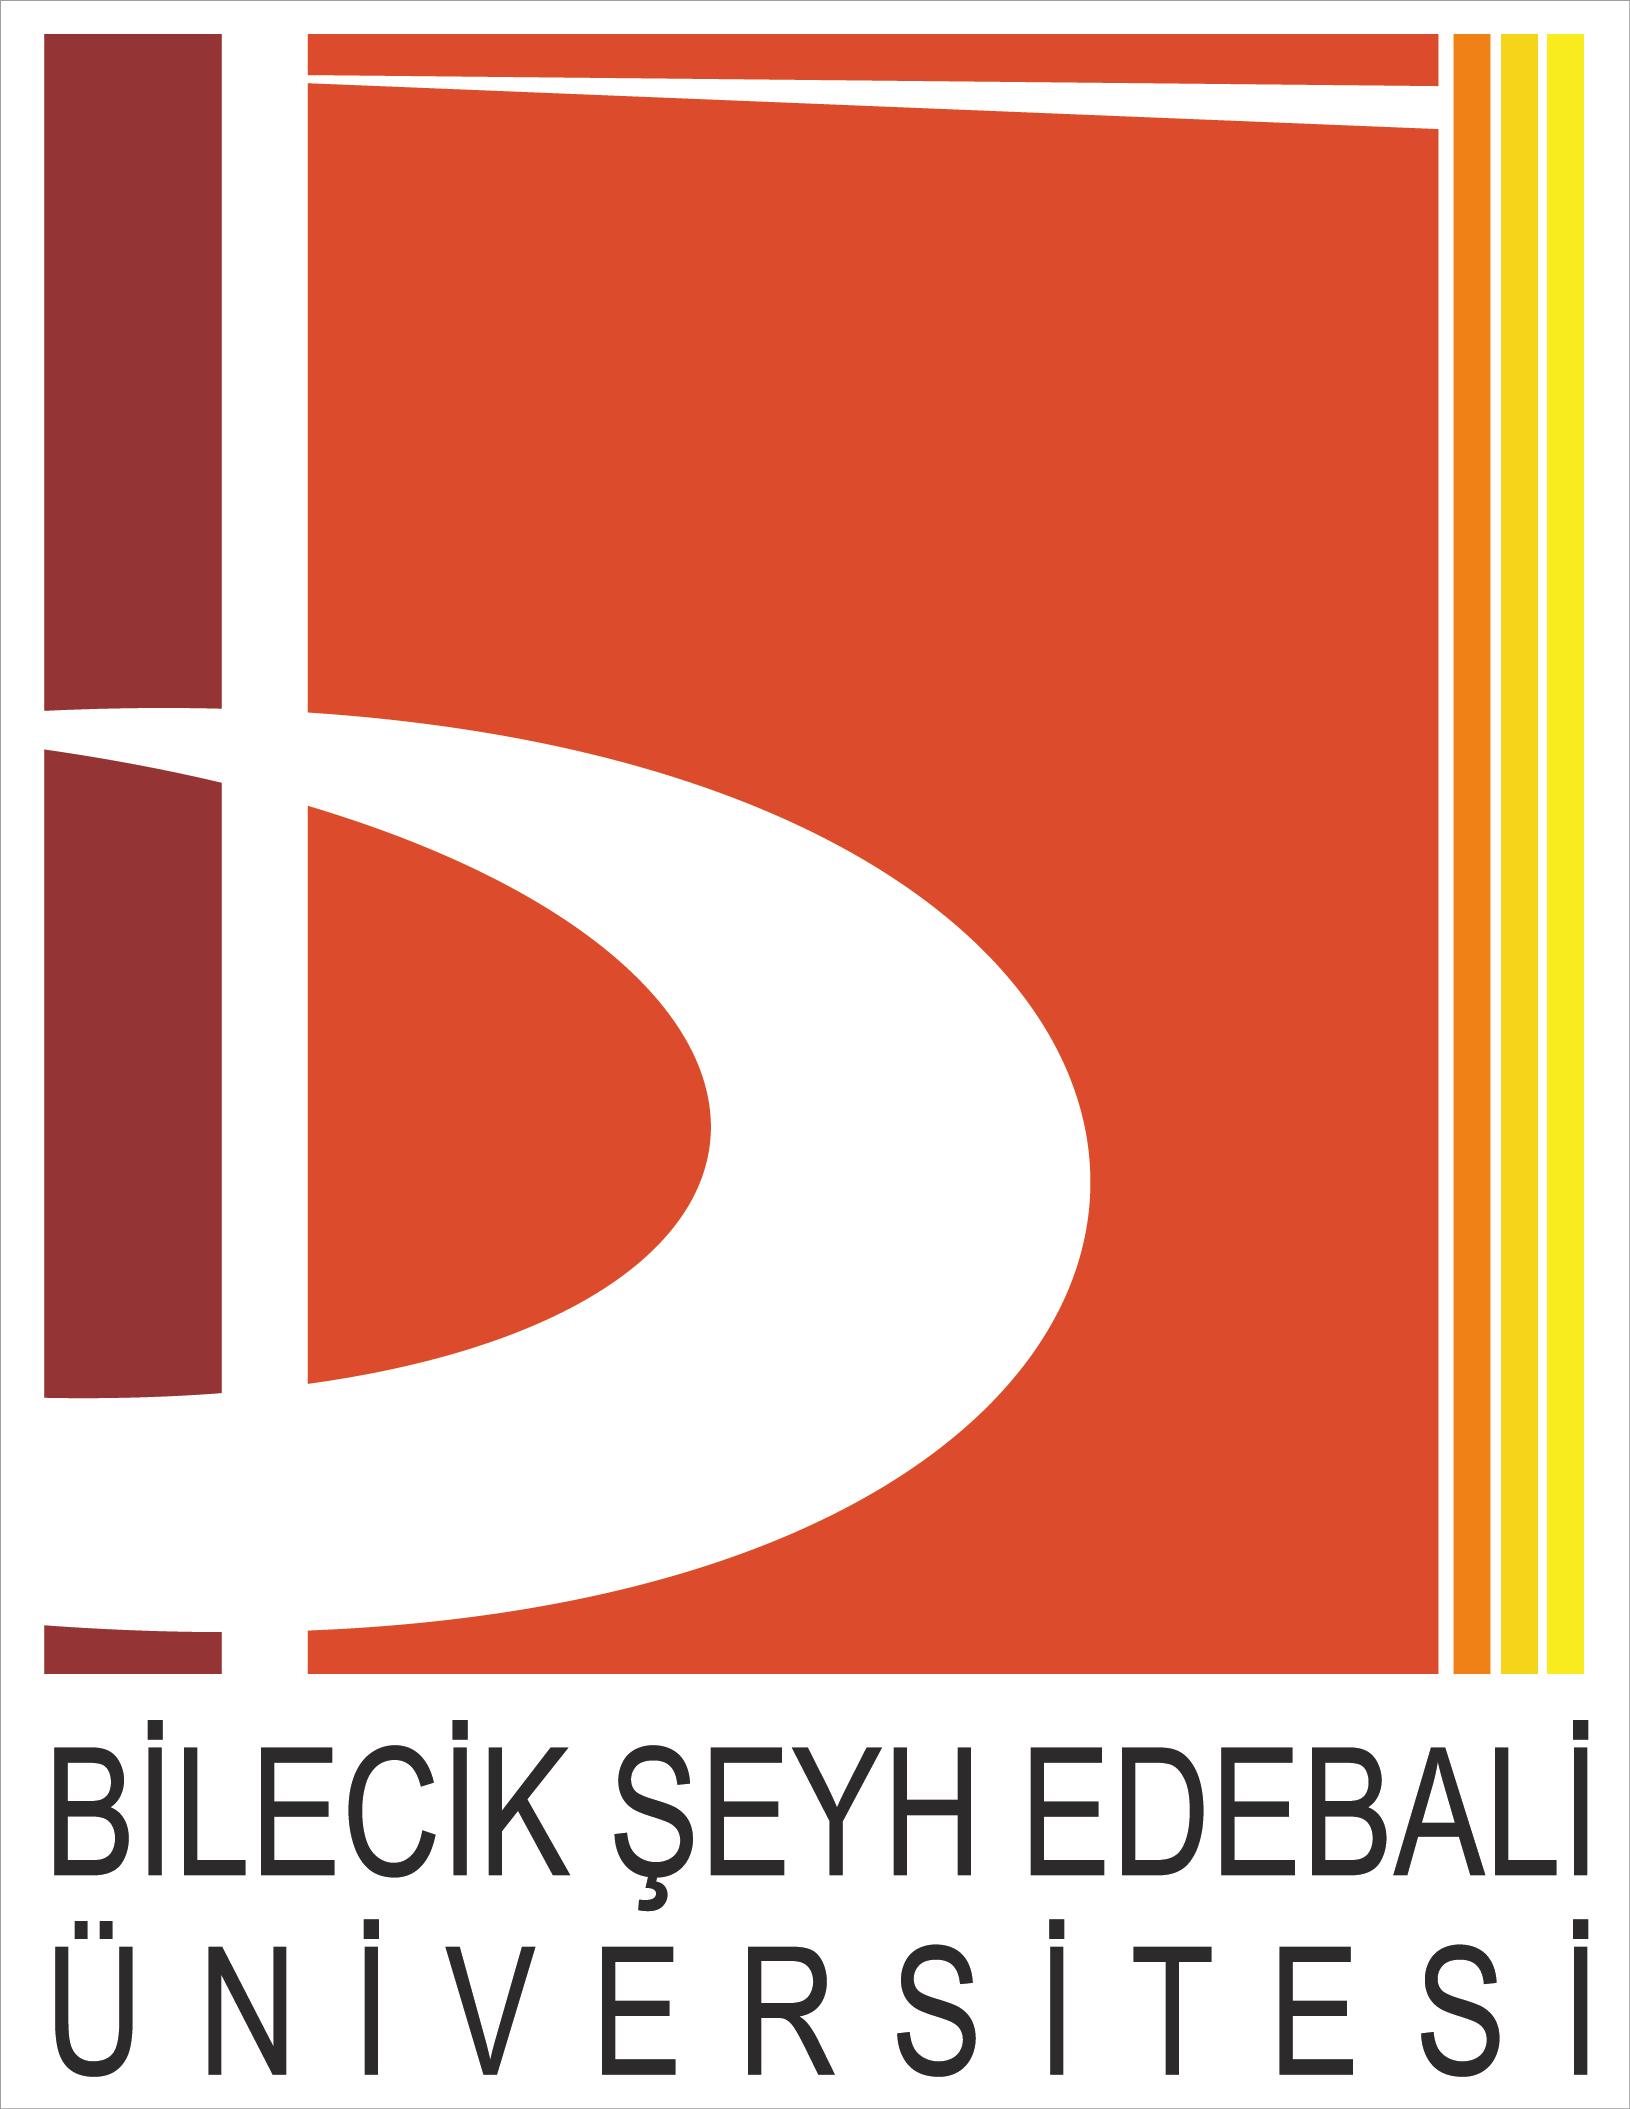 Bilecik Şeyh Edebali Üniversitesi Logo   Arma png